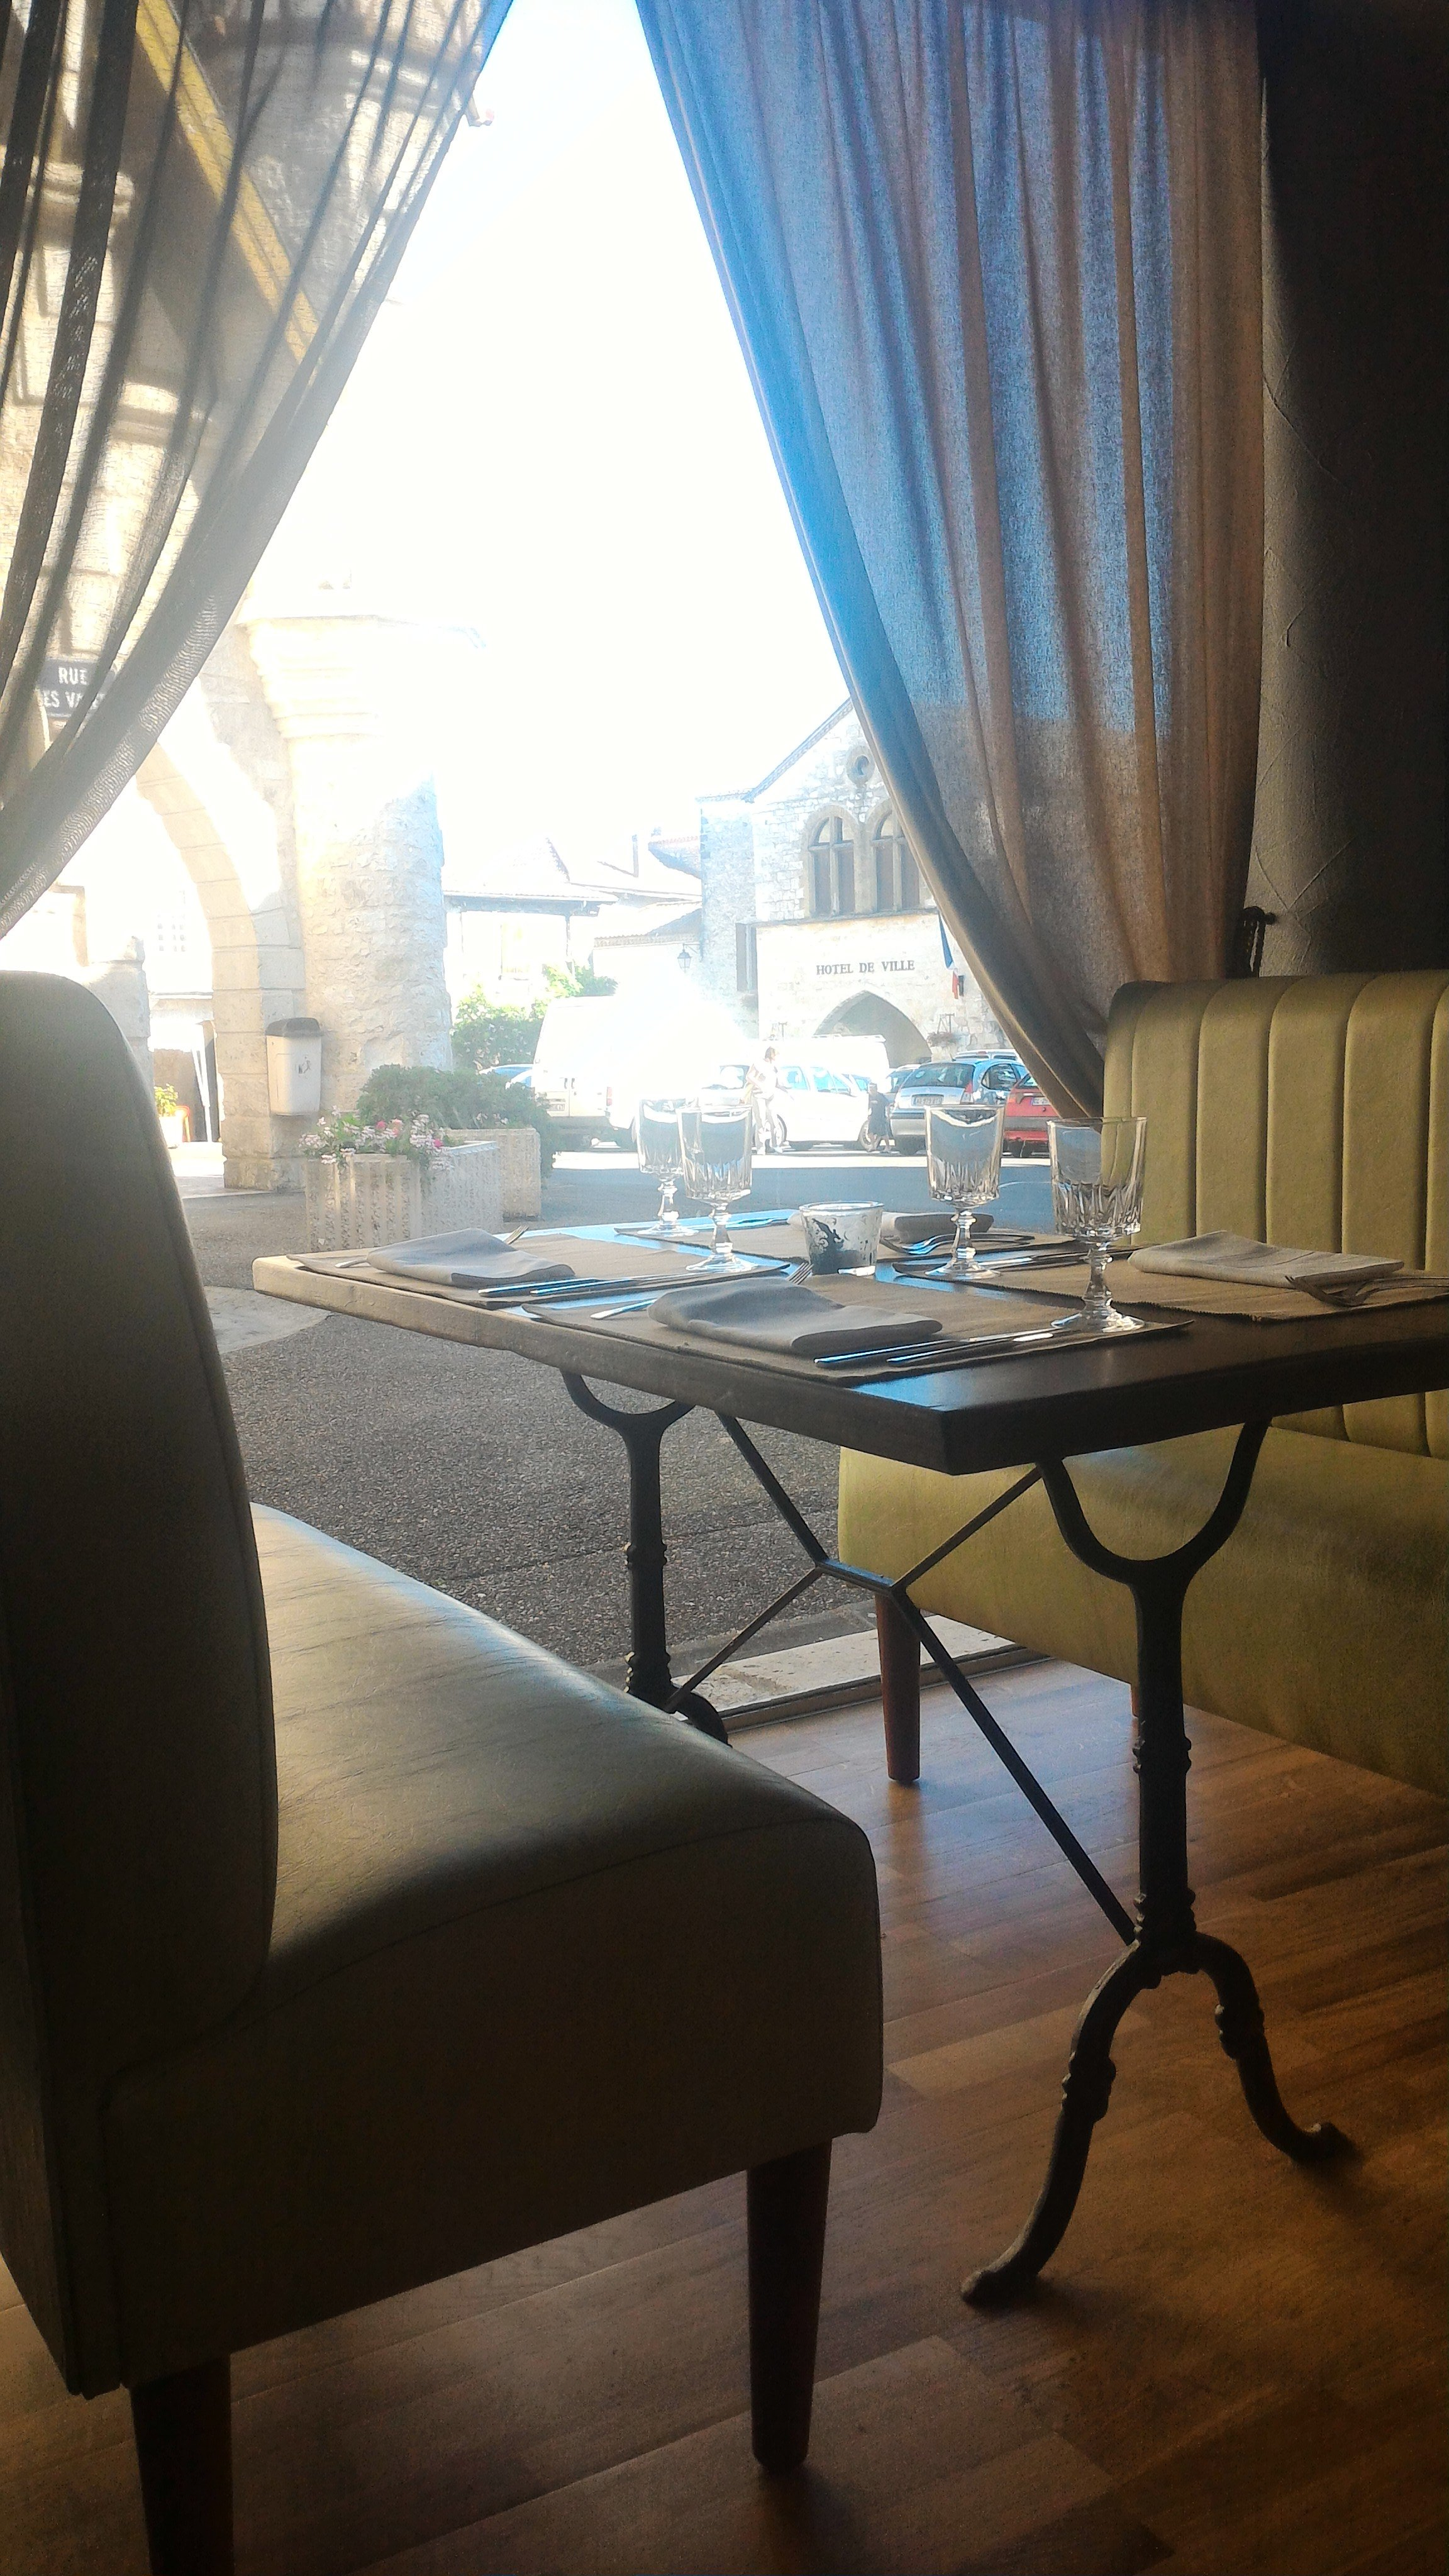 L Entree Chambres d Hotes & Restaurant Castillonnes France